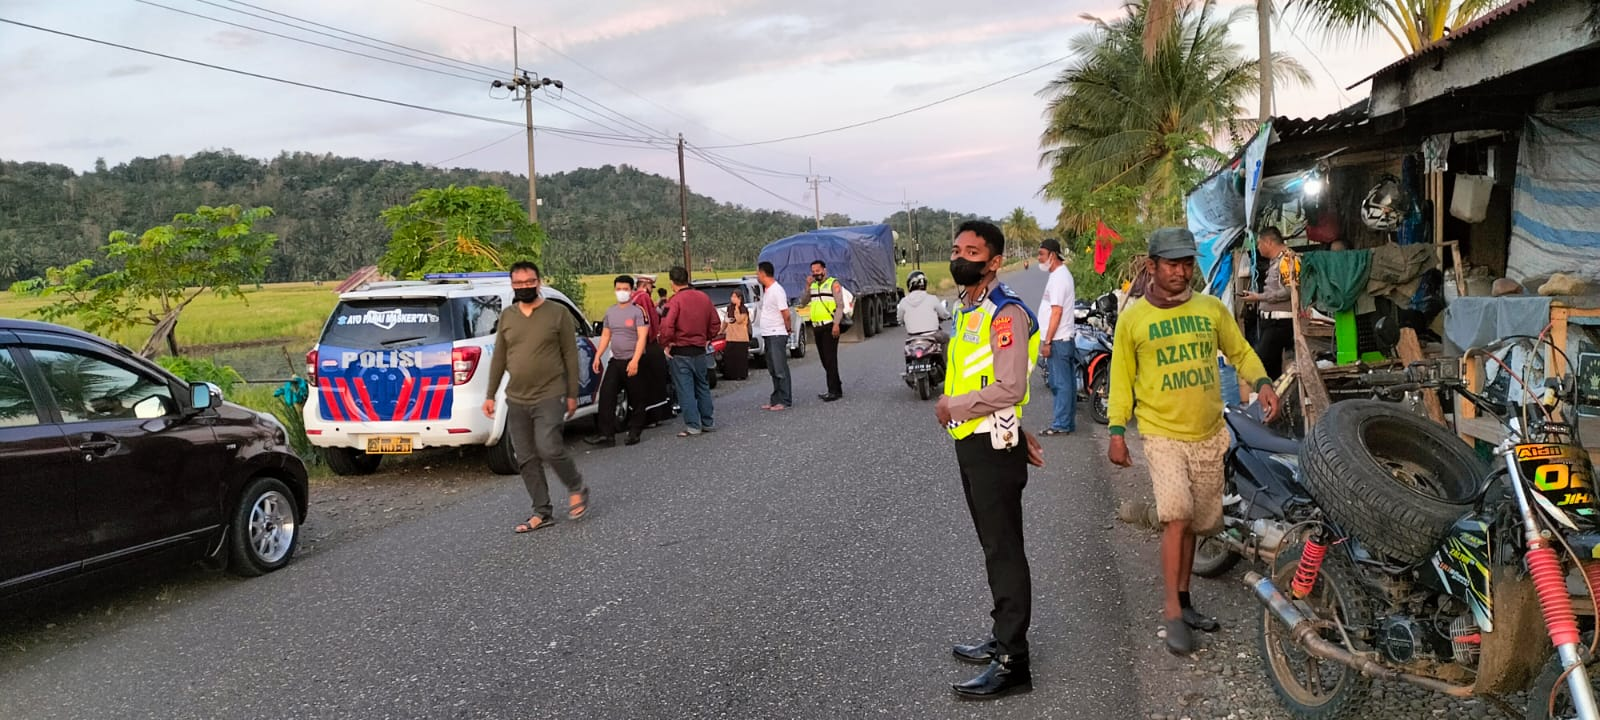 Kasat Lantas Polres Soppeng Pimpin Operasi di Daerah Rawan Pelanggaran dan Kecelakaan